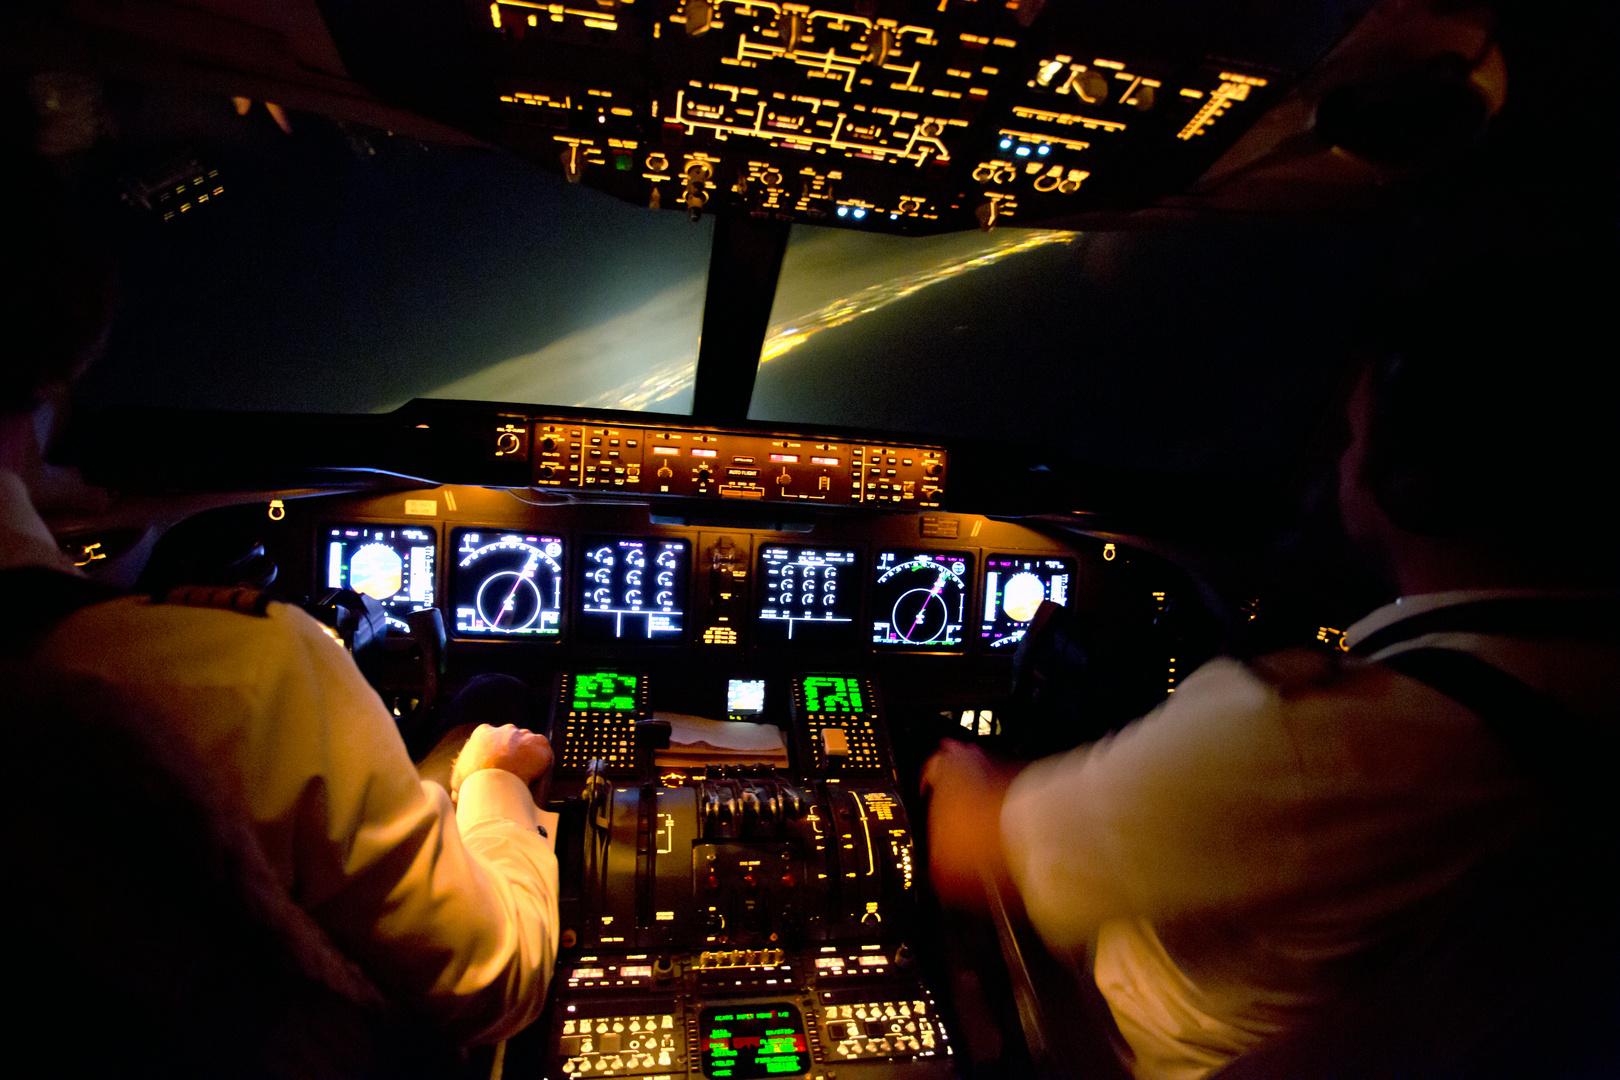 MD11F Cockpit Anflug am Bosporus